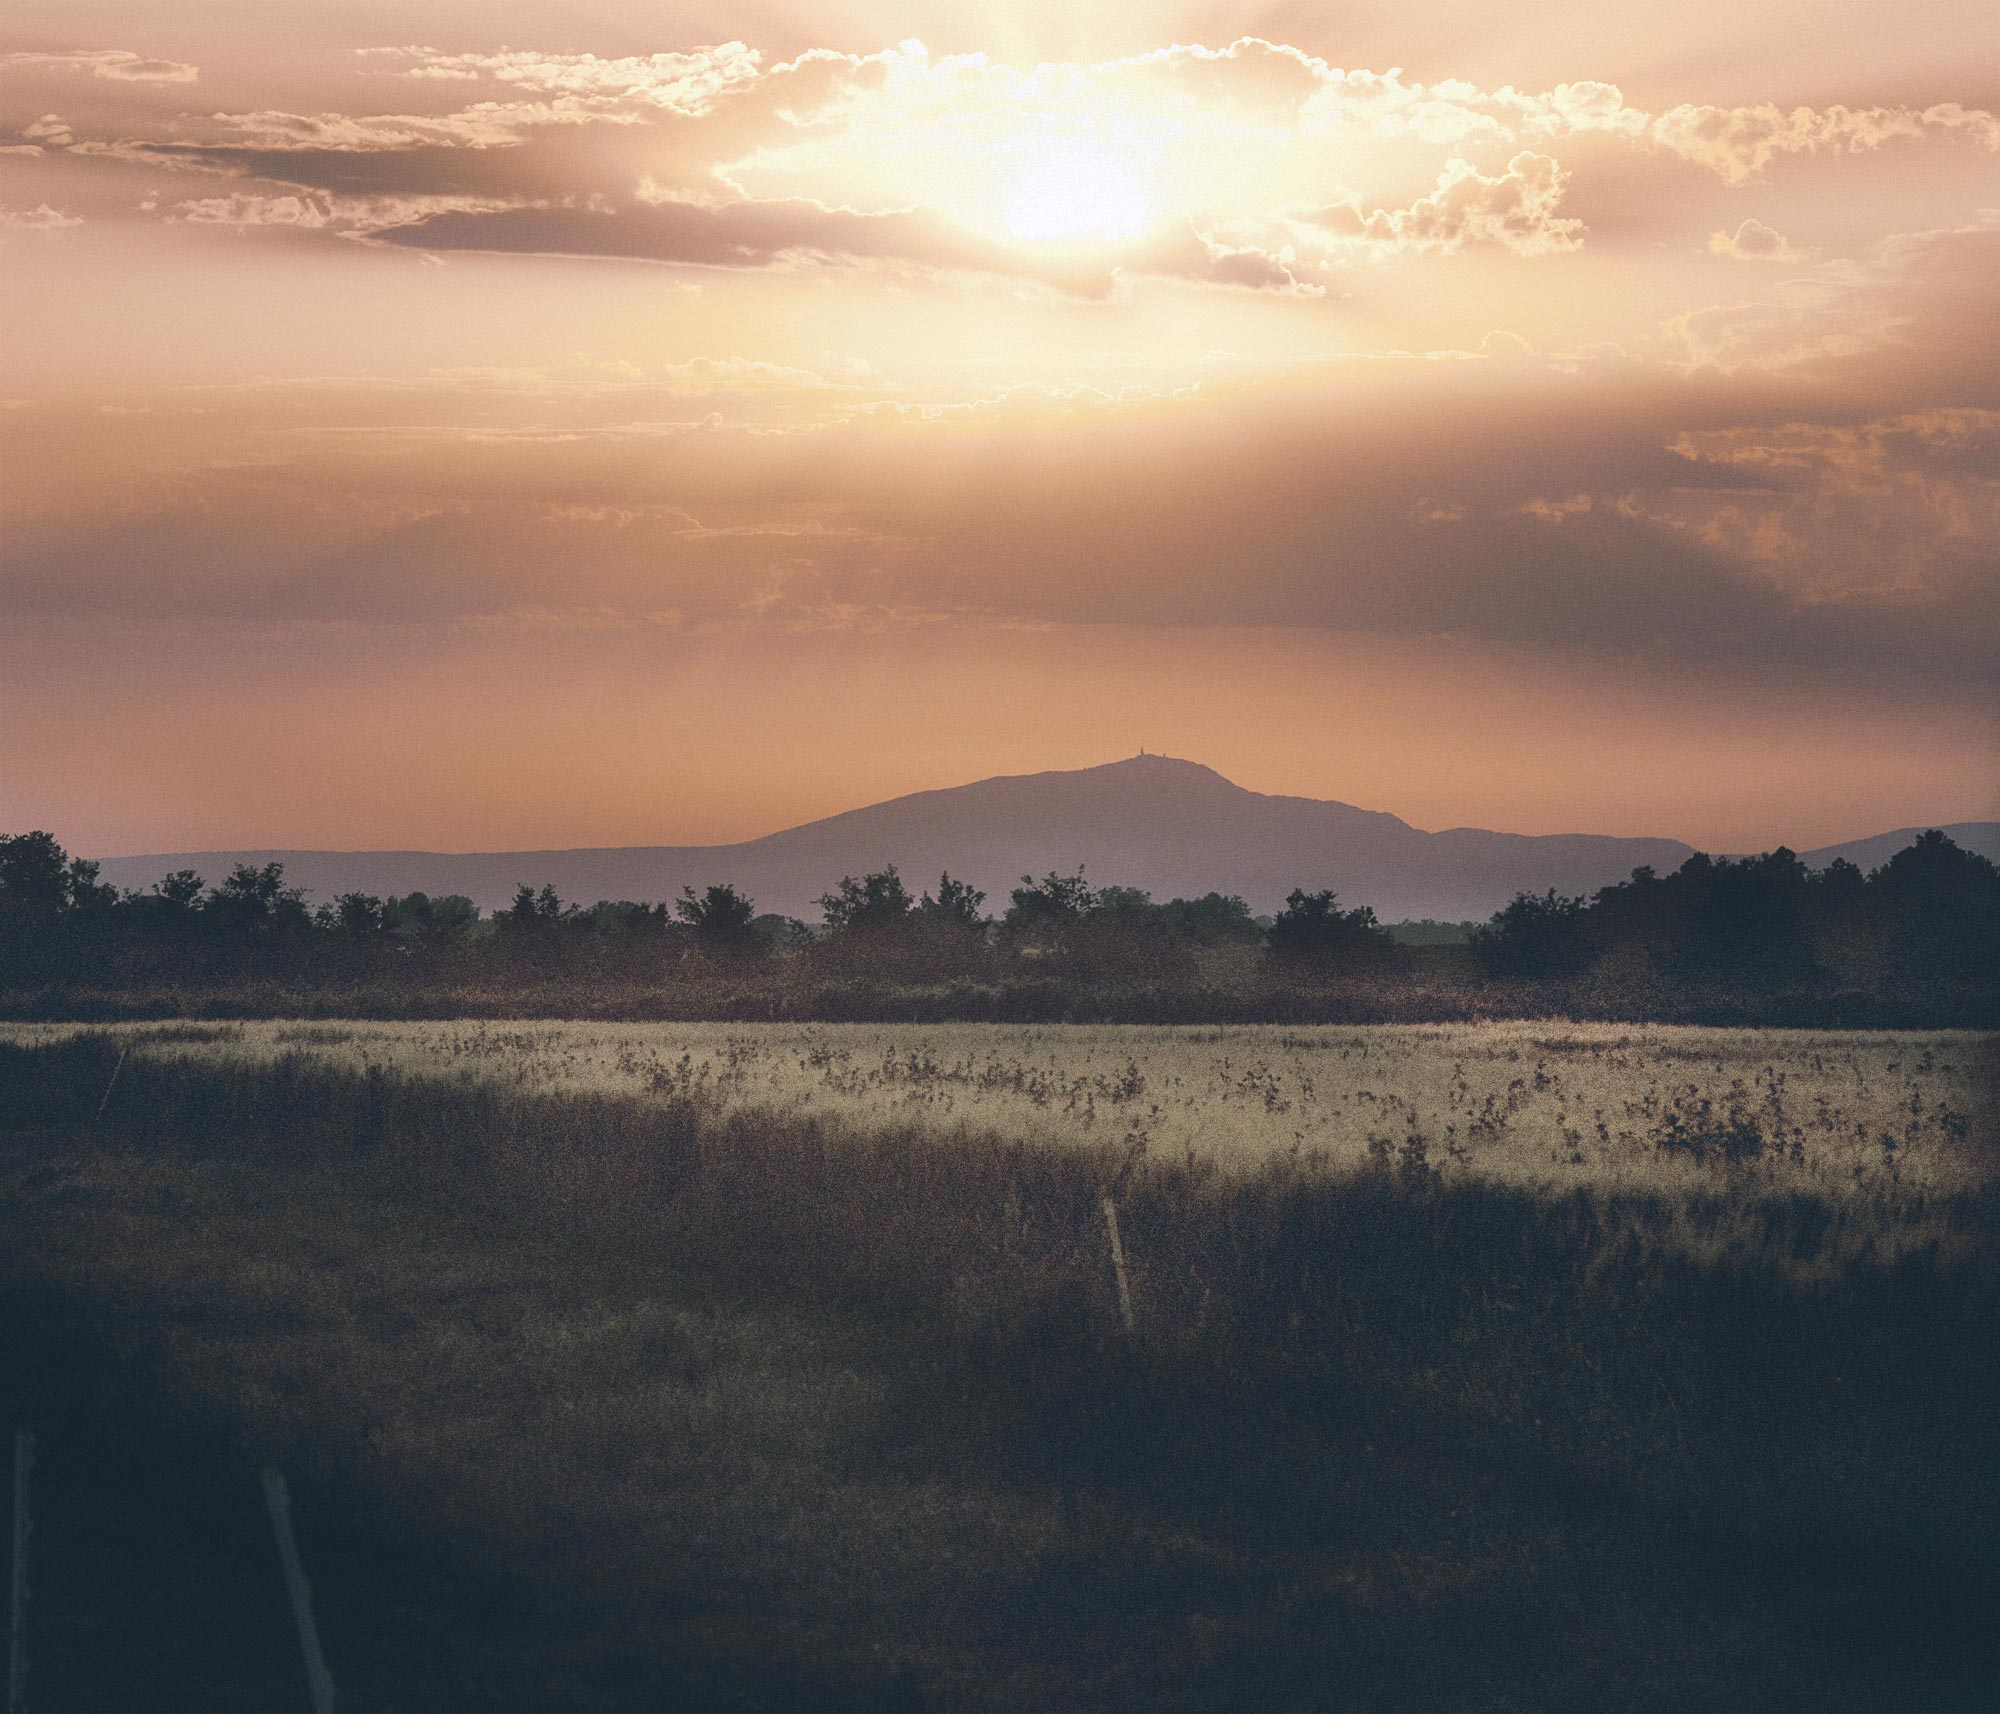 environnement_paysage